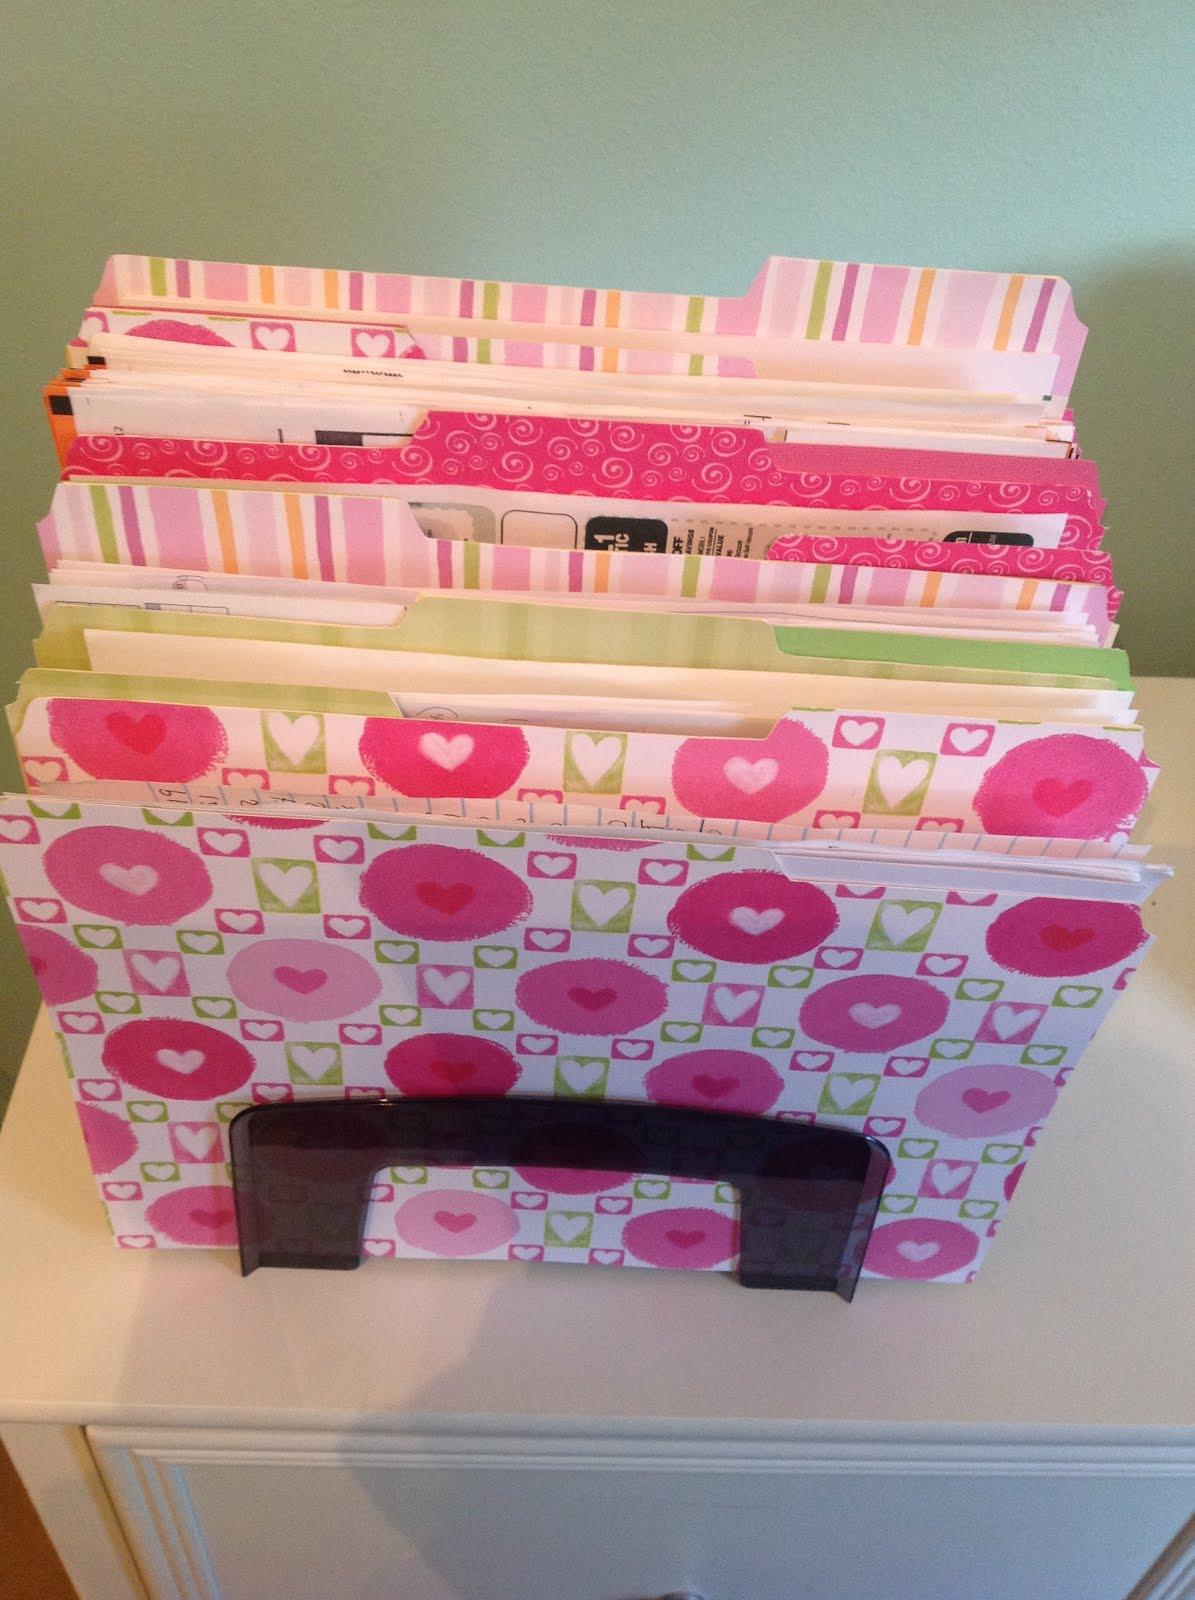 O Is For Organize Decorative File Folders. Brown Decorative Balls. Cheap Decorative Throw Pillows. Paper Roll Decorations. Dorm Room Dresser. Diamond Decor. Full Room Rugs. Exam Room Furniture. Girl Room Designs